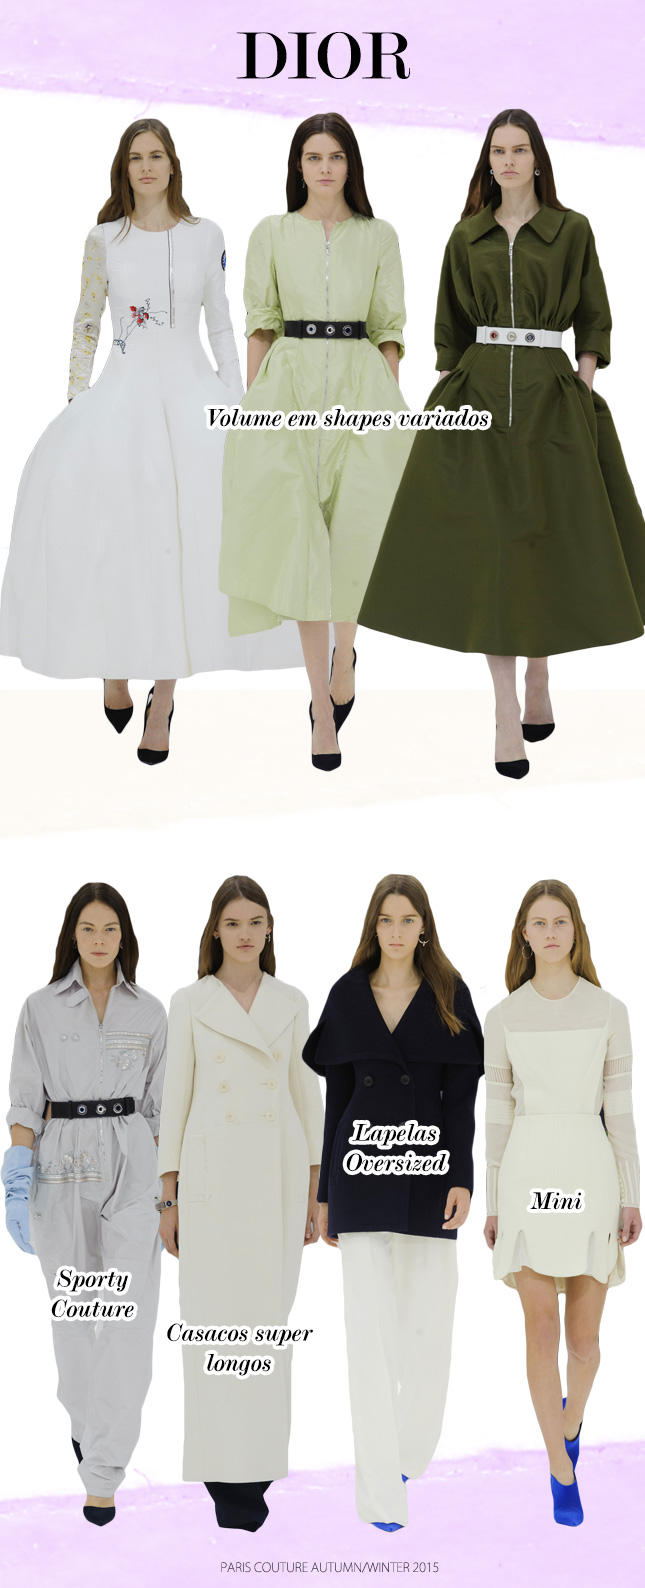 haute couture paris fashion week blog de moda oh my closet desfile dior tendencia inverno 2015 autumn winter couture